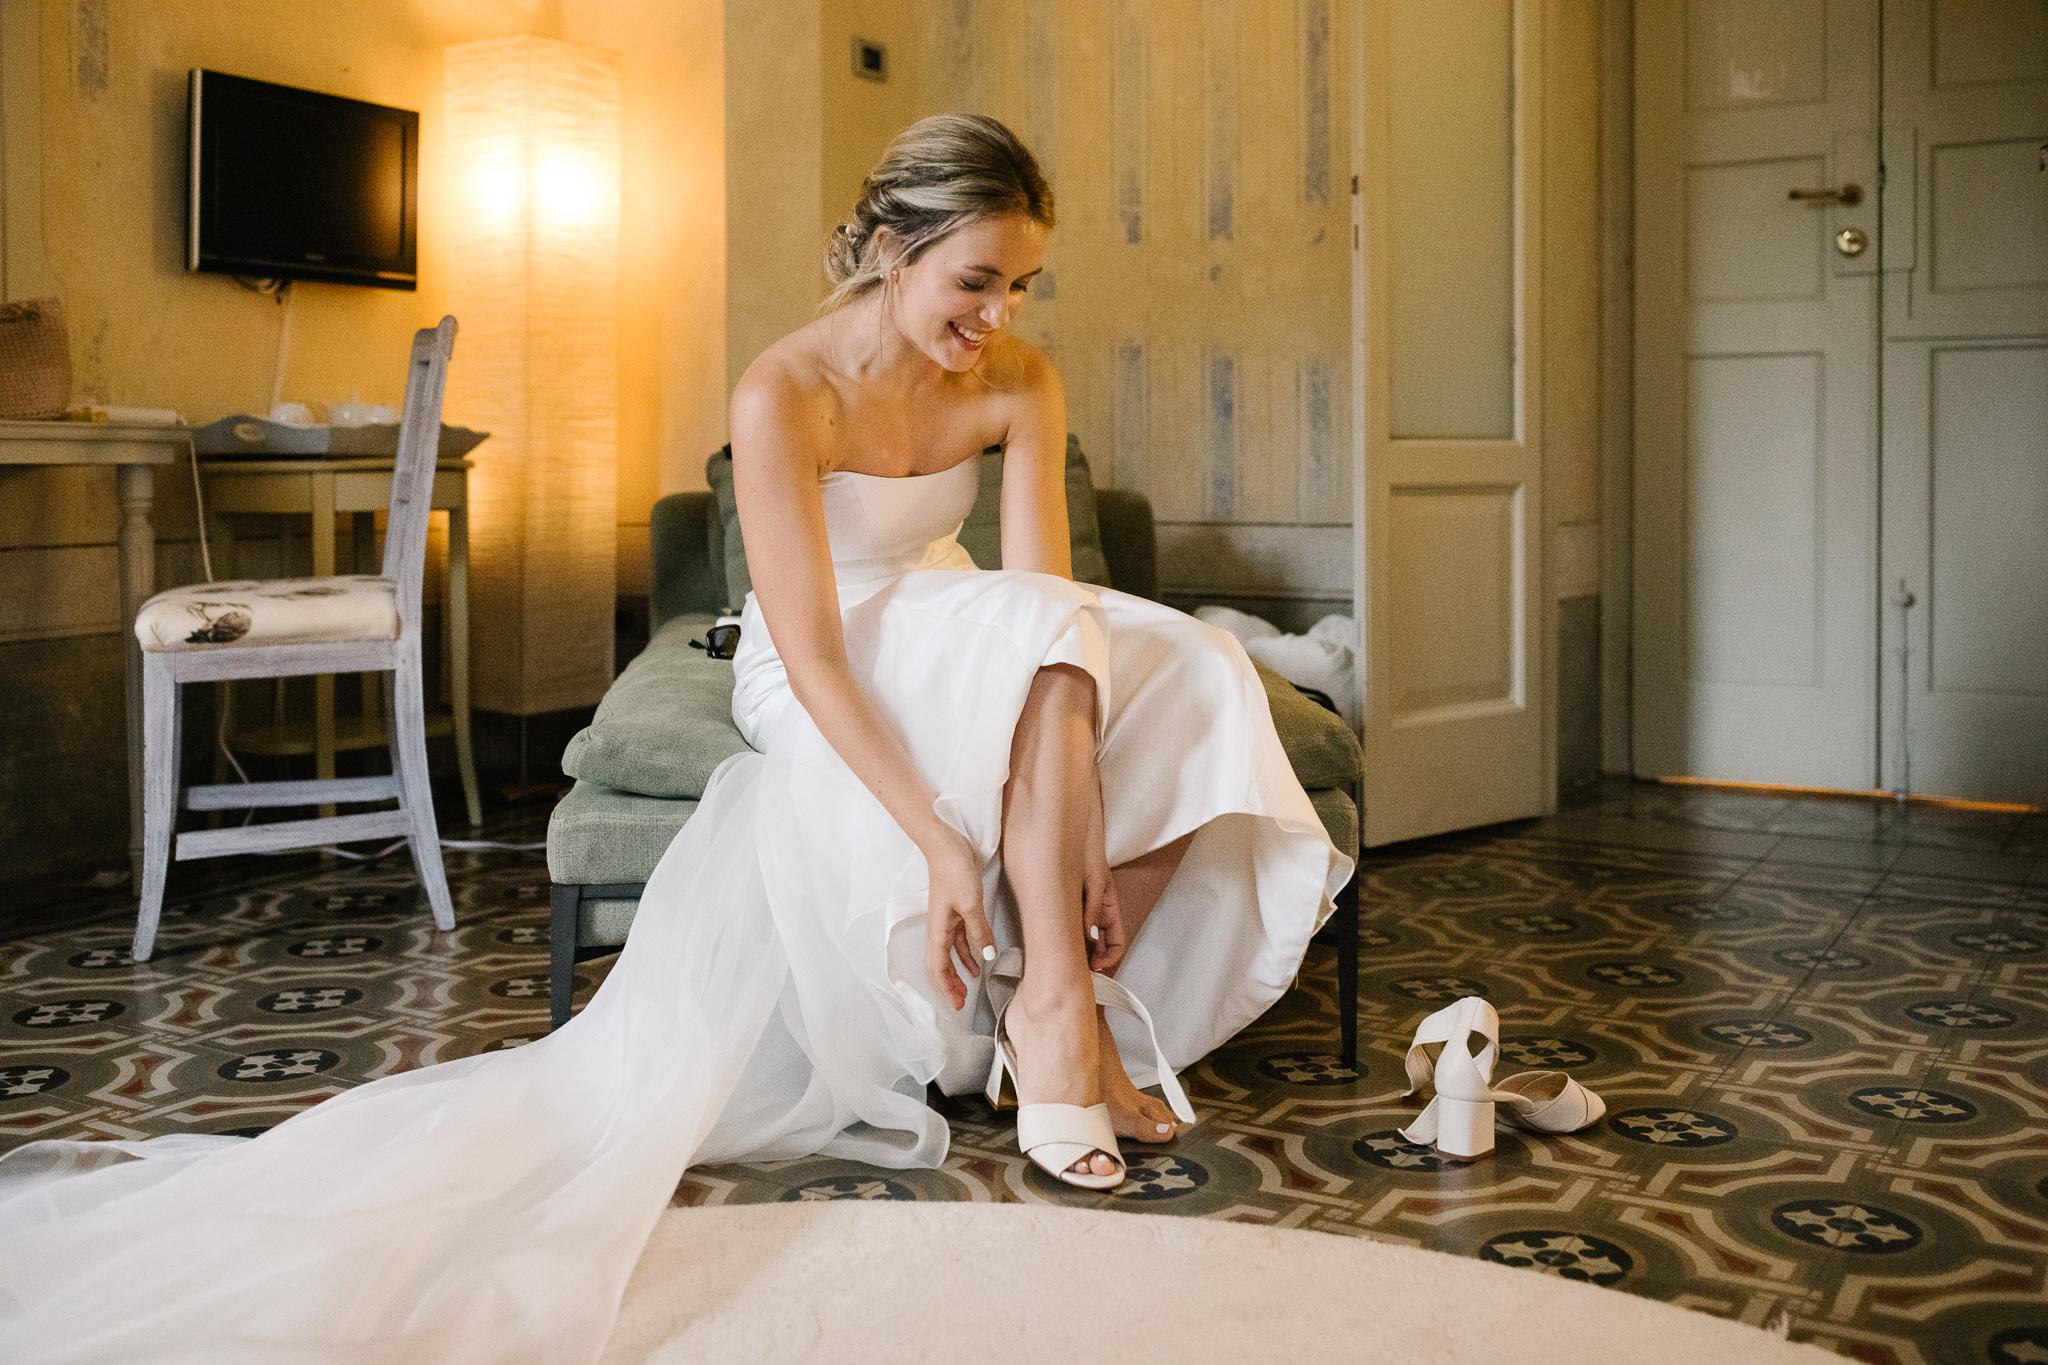 Xyris 2 - fited boned romantic strapless wedding dress.jpg